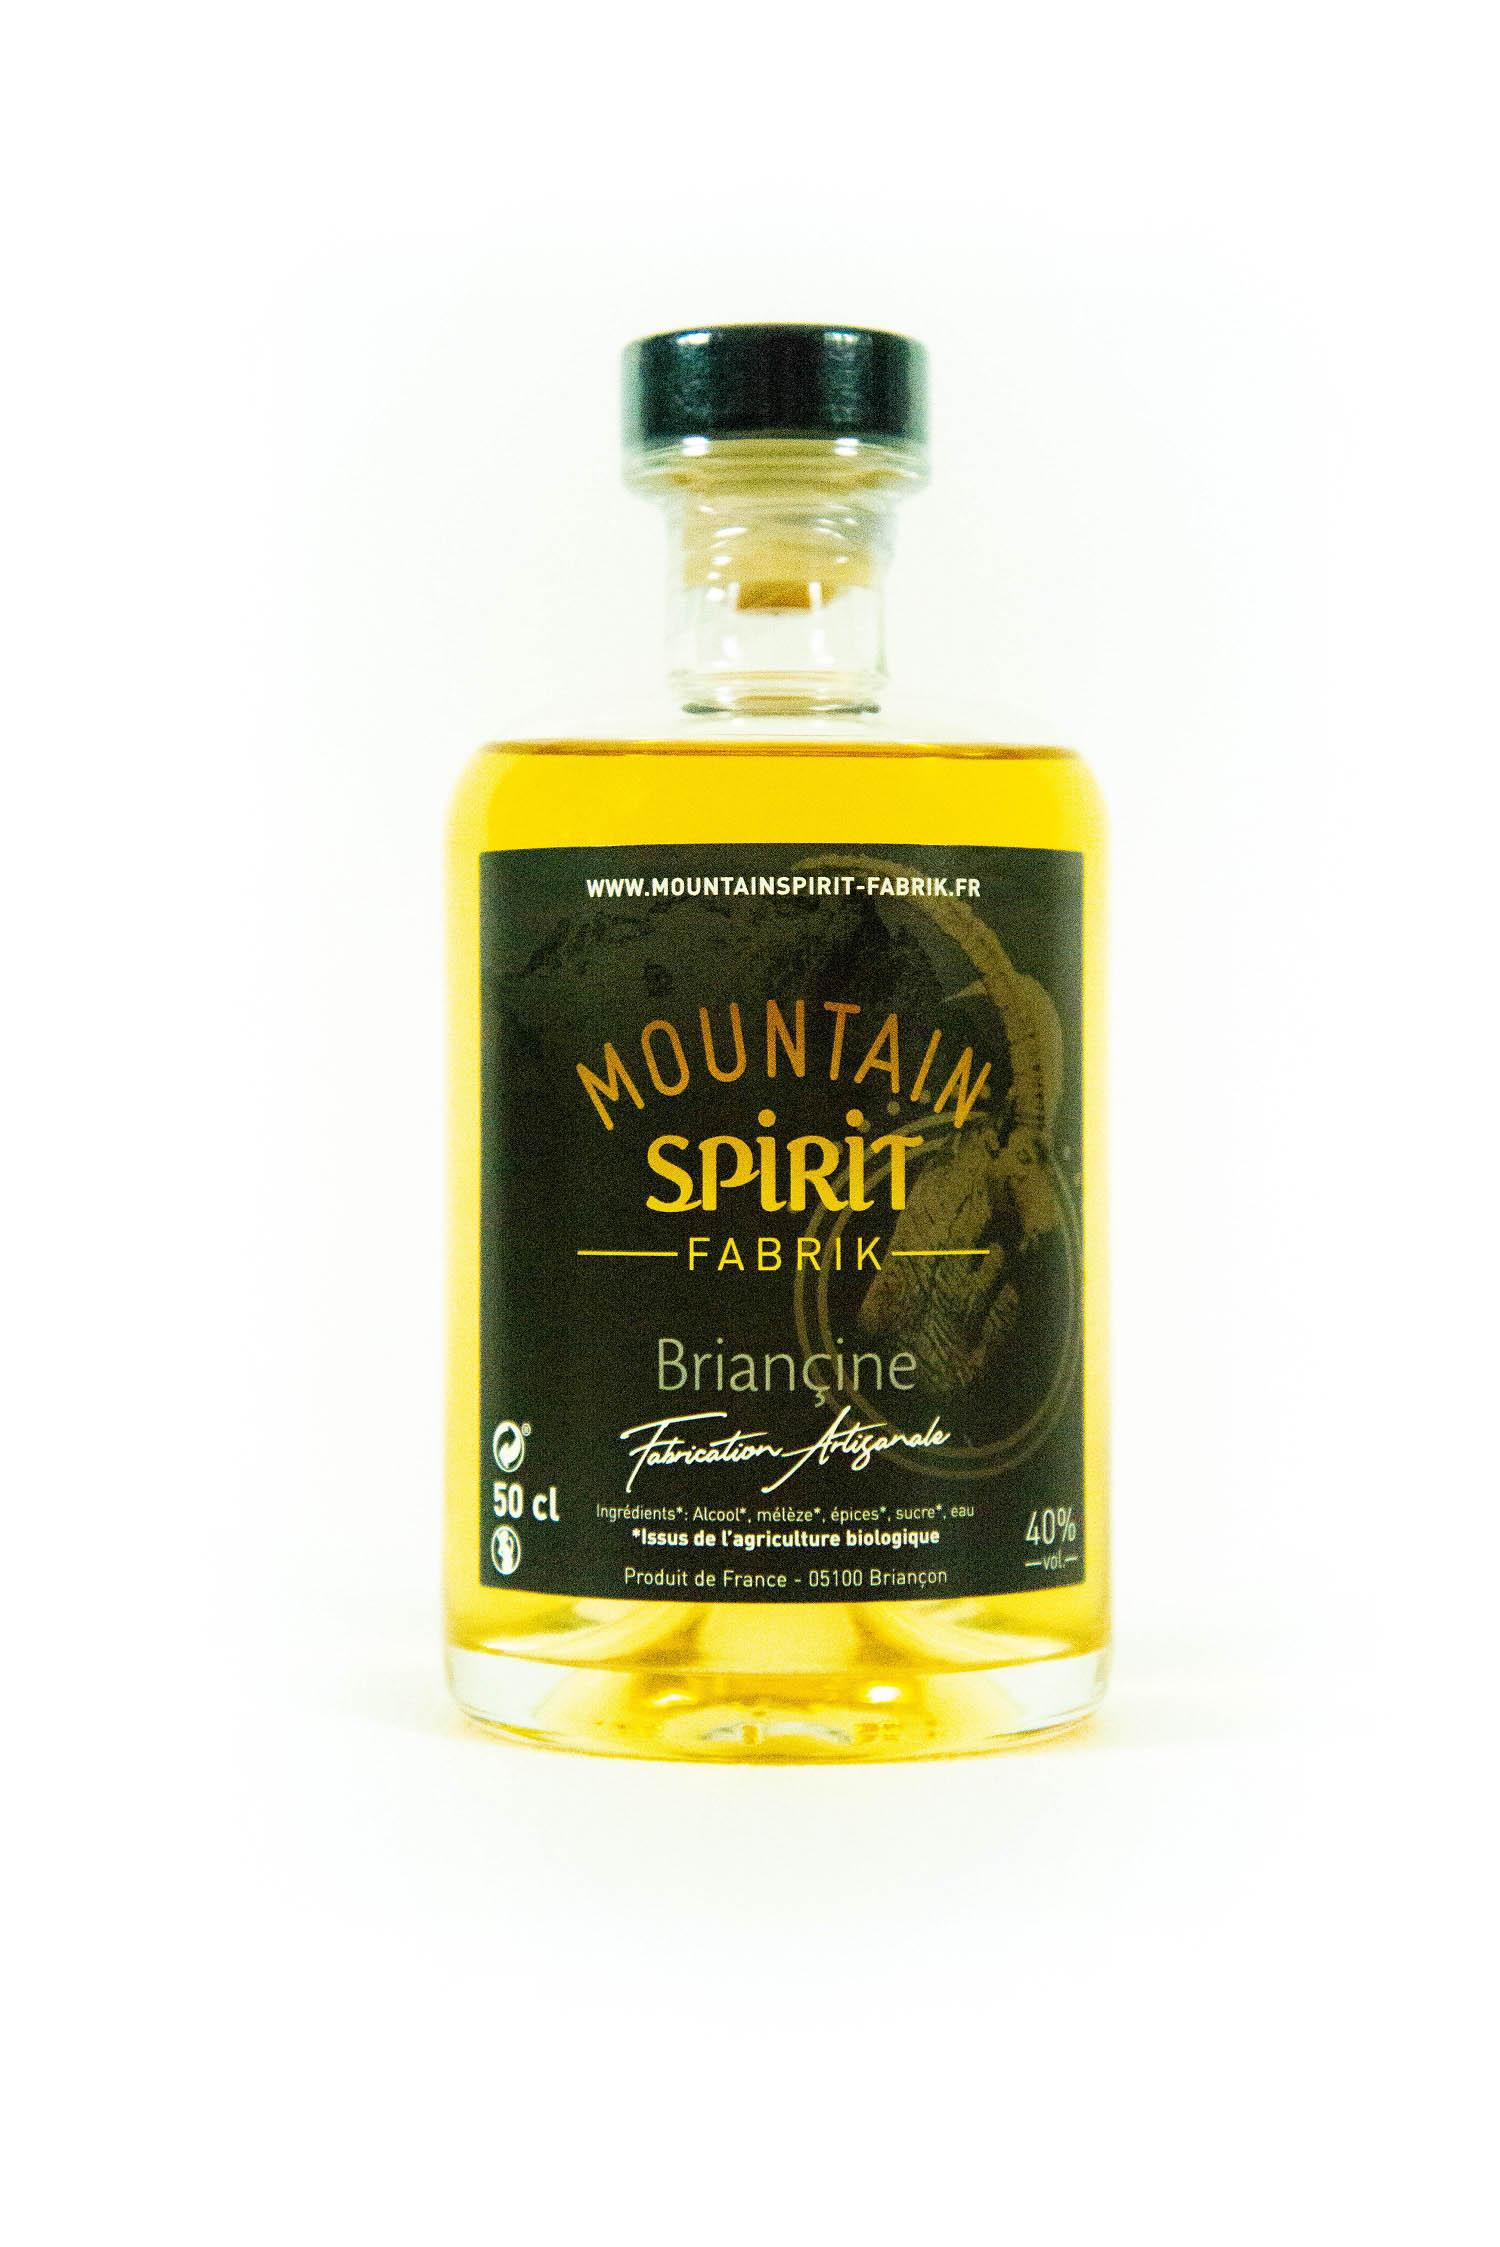 briançine-50cl-Mountain-Spirit-Fabrik-Briançon